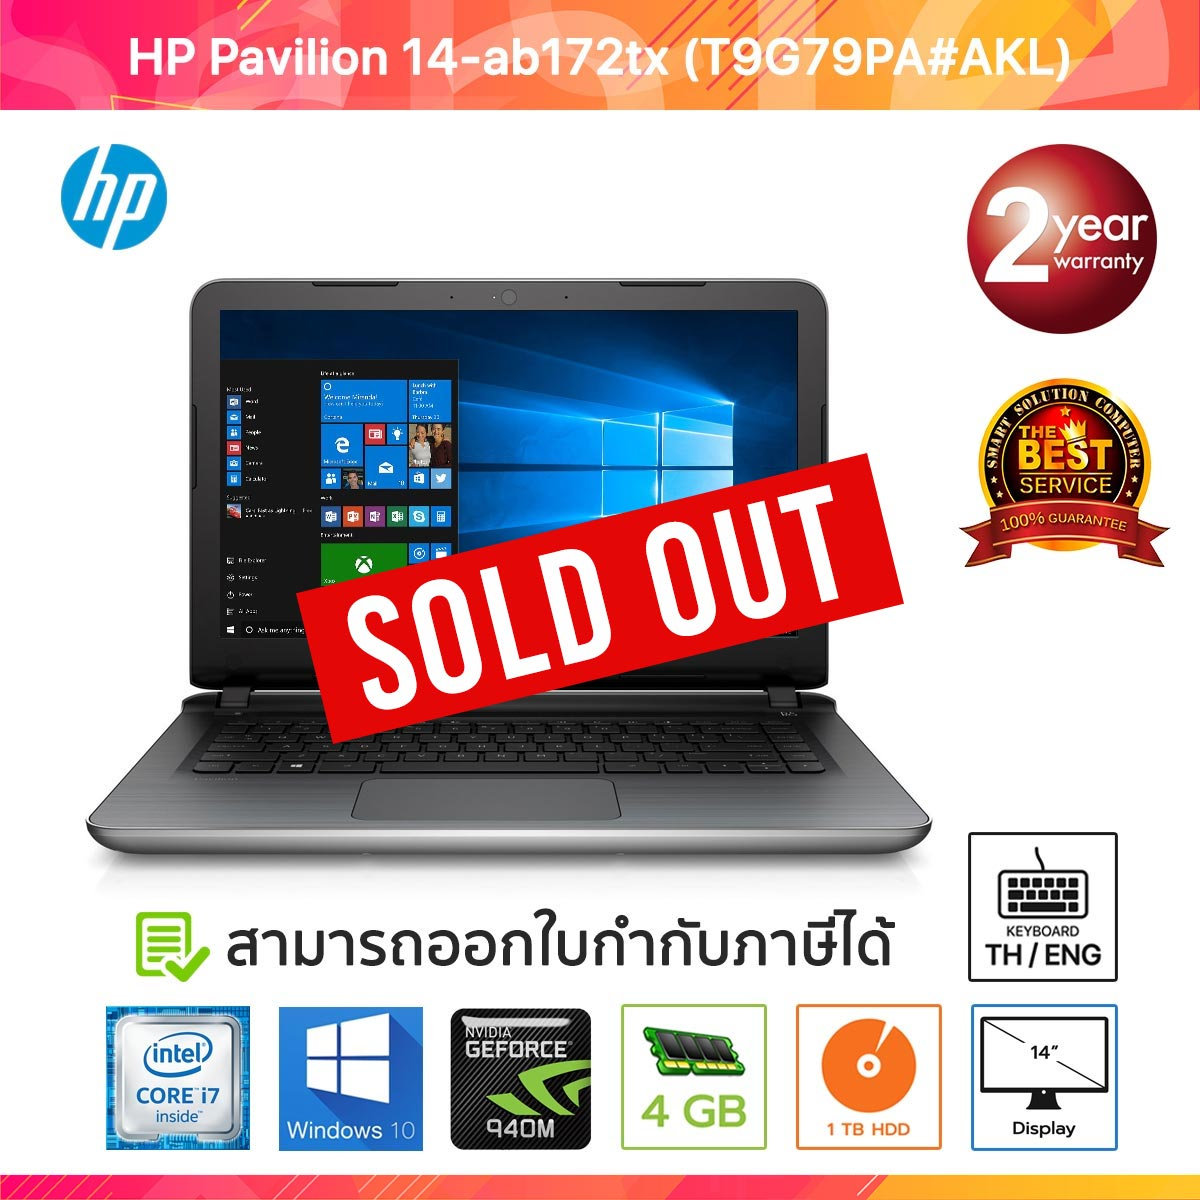 HP Pavilion 14-ab172tx (T9G79PA#AKL) i7-6500U 4GB 1TB GT940M 14